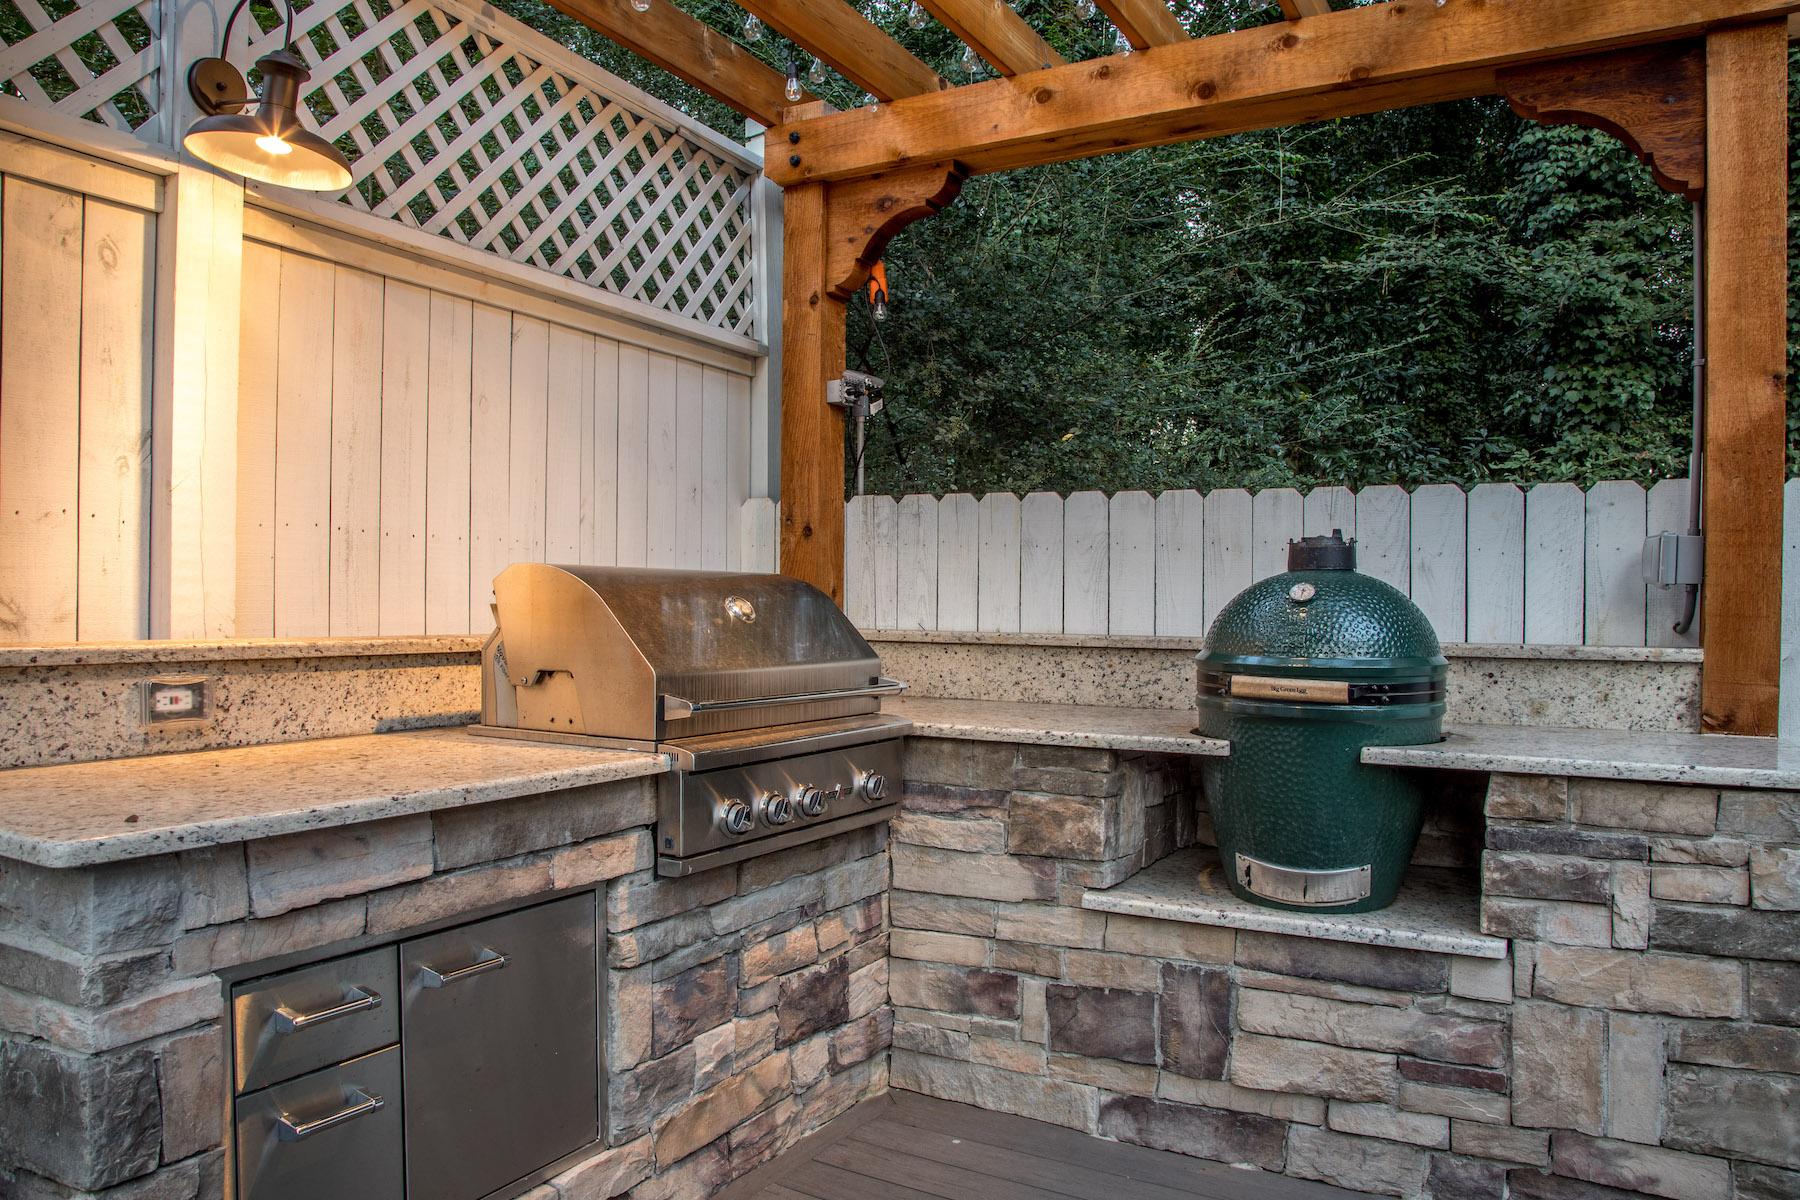 smyrna-ga-builder-pergola-big-green-egg-table-rock-outdoor-kitchen